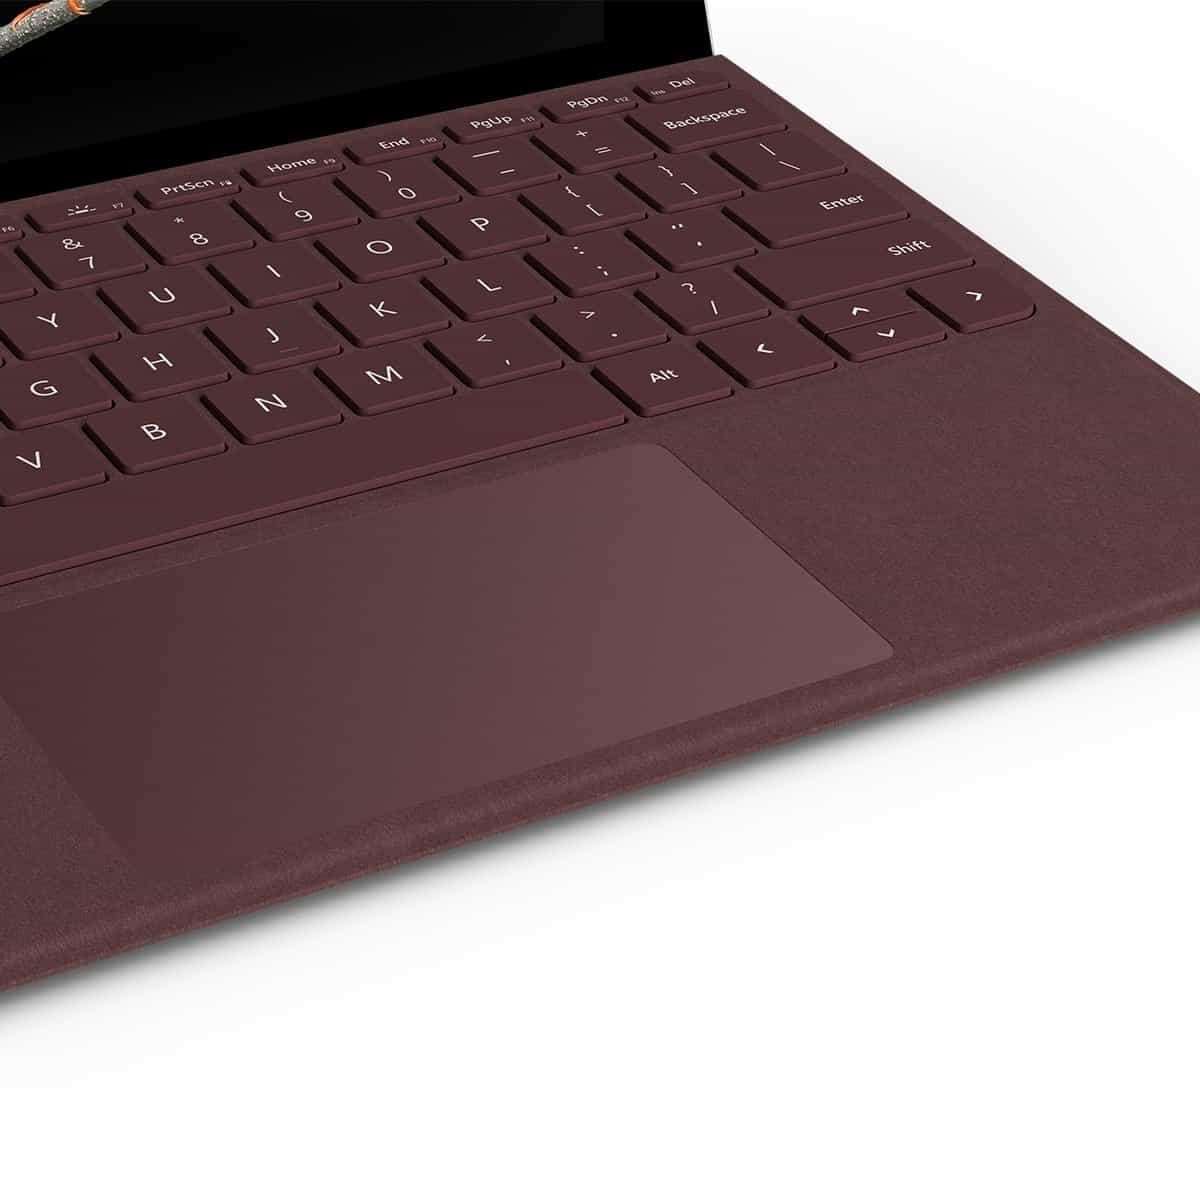 کیبورد تبلت مایکروسافت سرفیس مدل (Surface Go Alcantara Signature Type Cover (KCS-00041 - رنگ قرمز شرابی - جعبه باز main-1 2